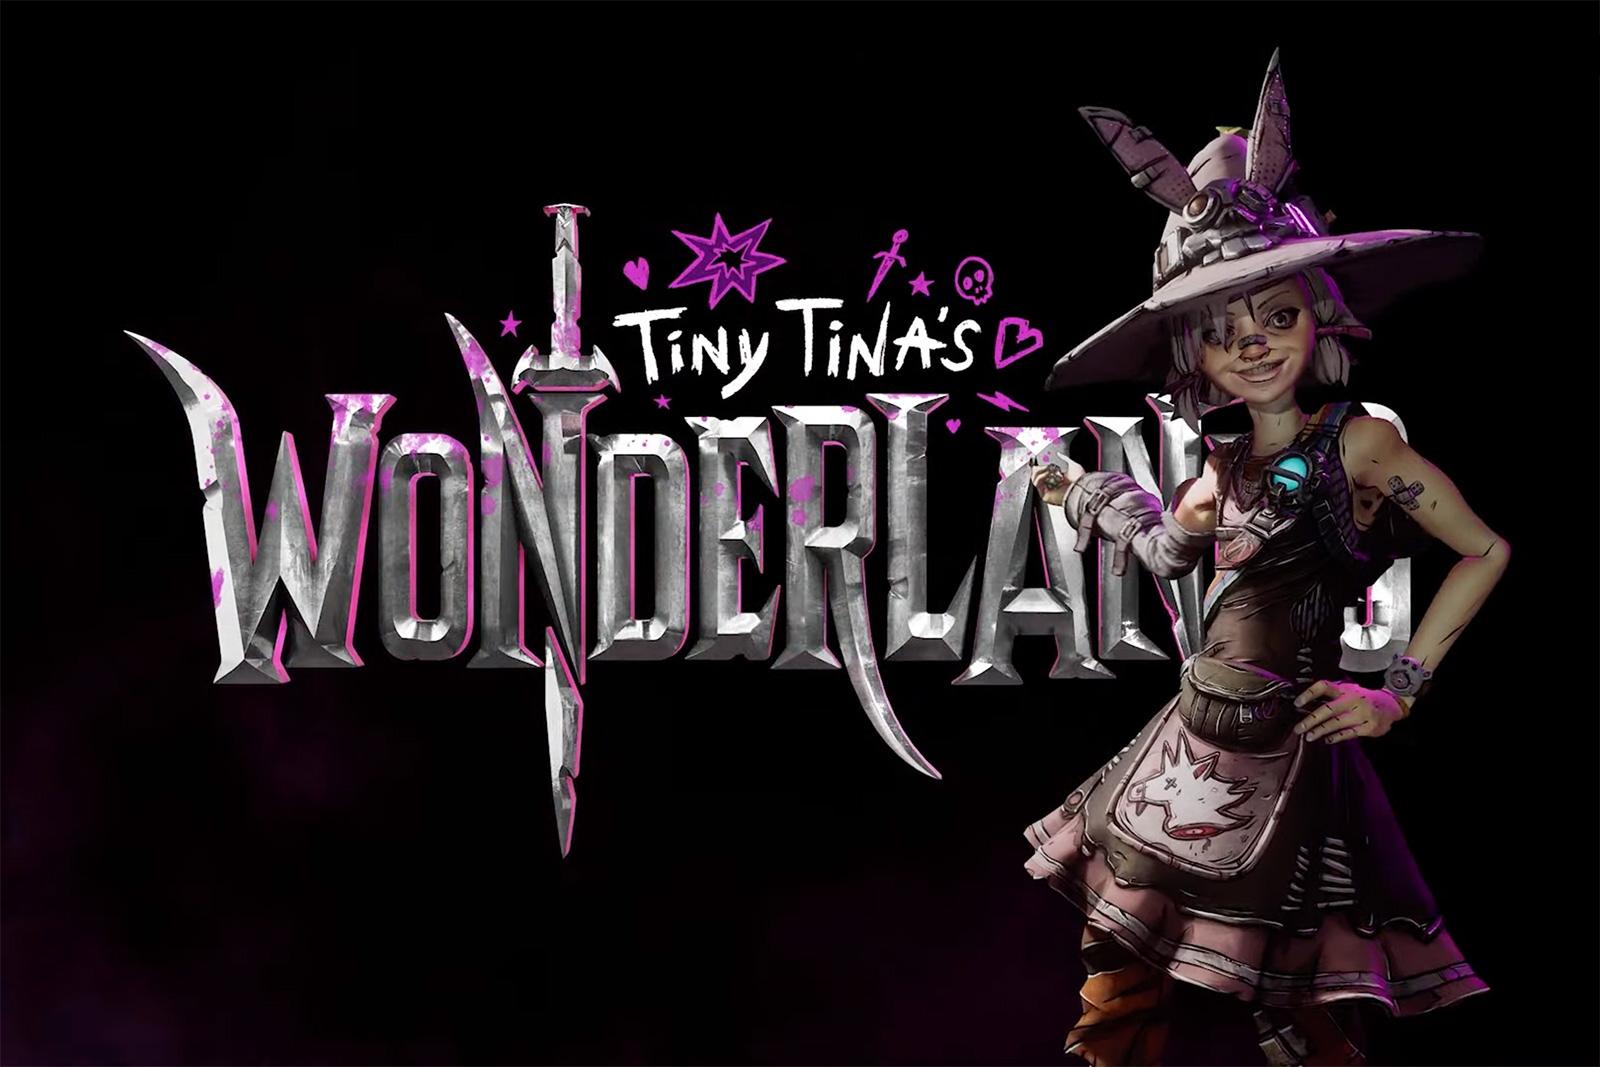 tiny-tinas-wonderland-tinytina